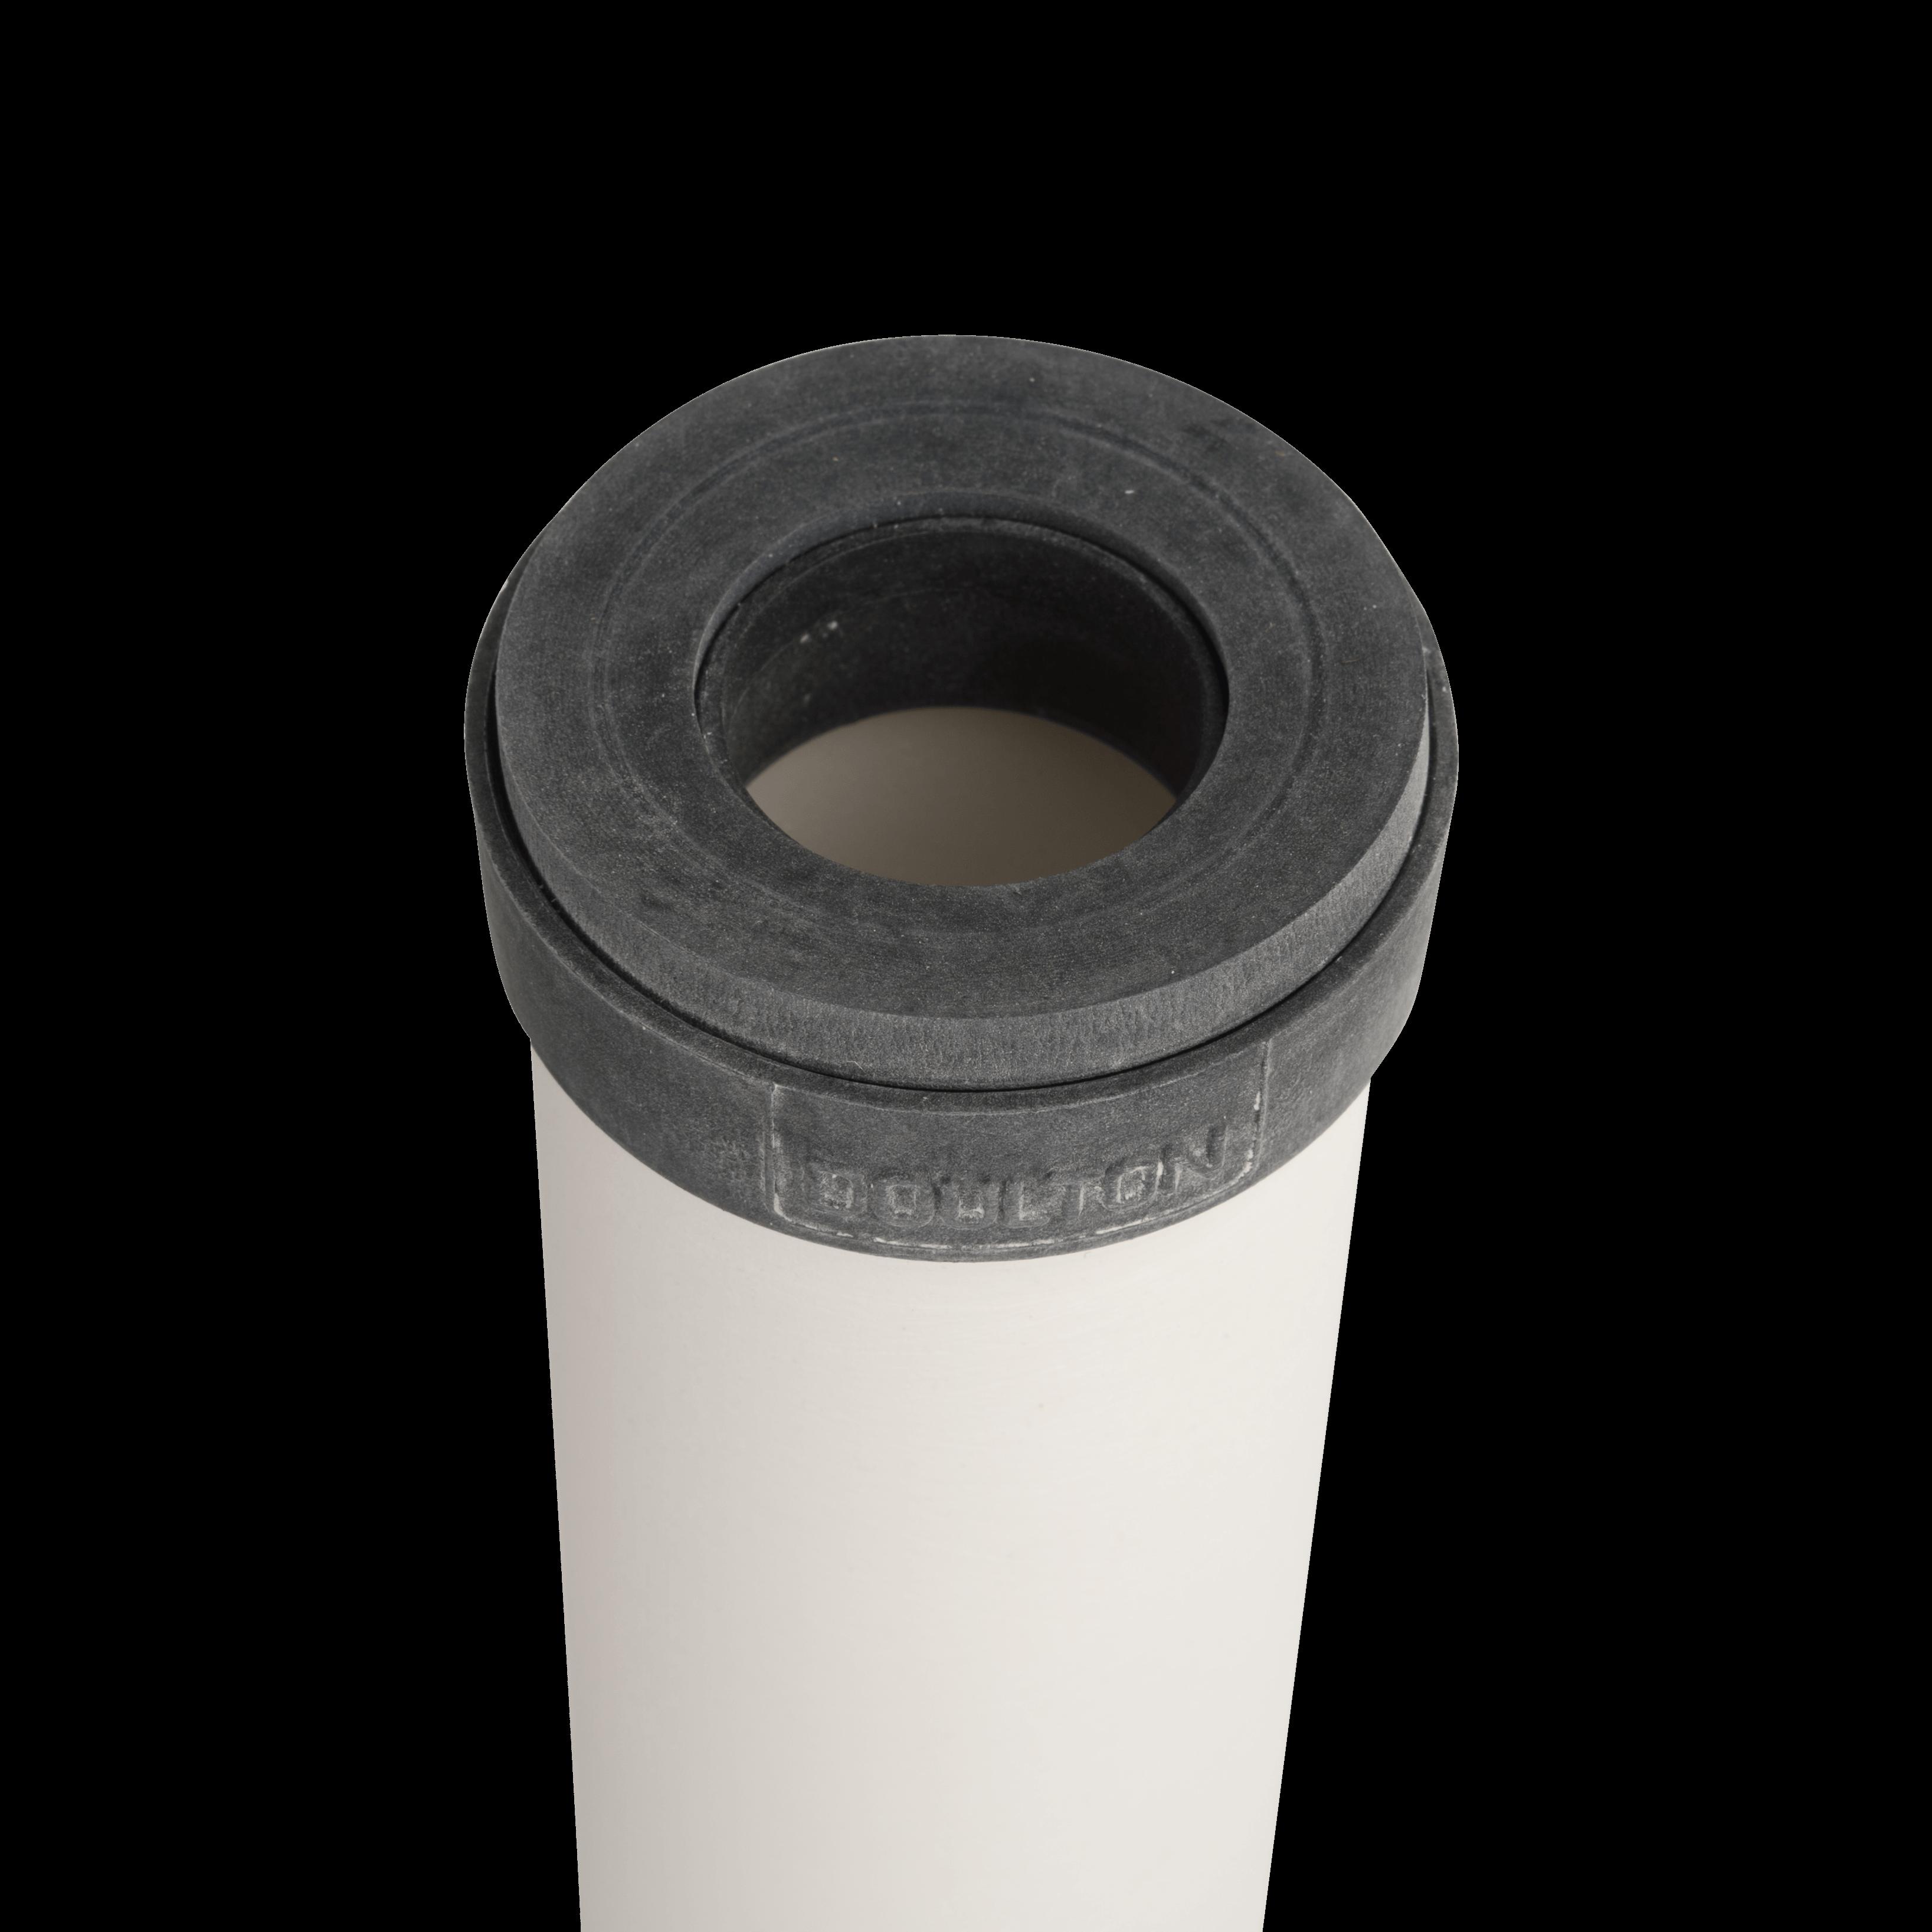 Ceramic Filter Cartridge Mount Vital Pty Ltd